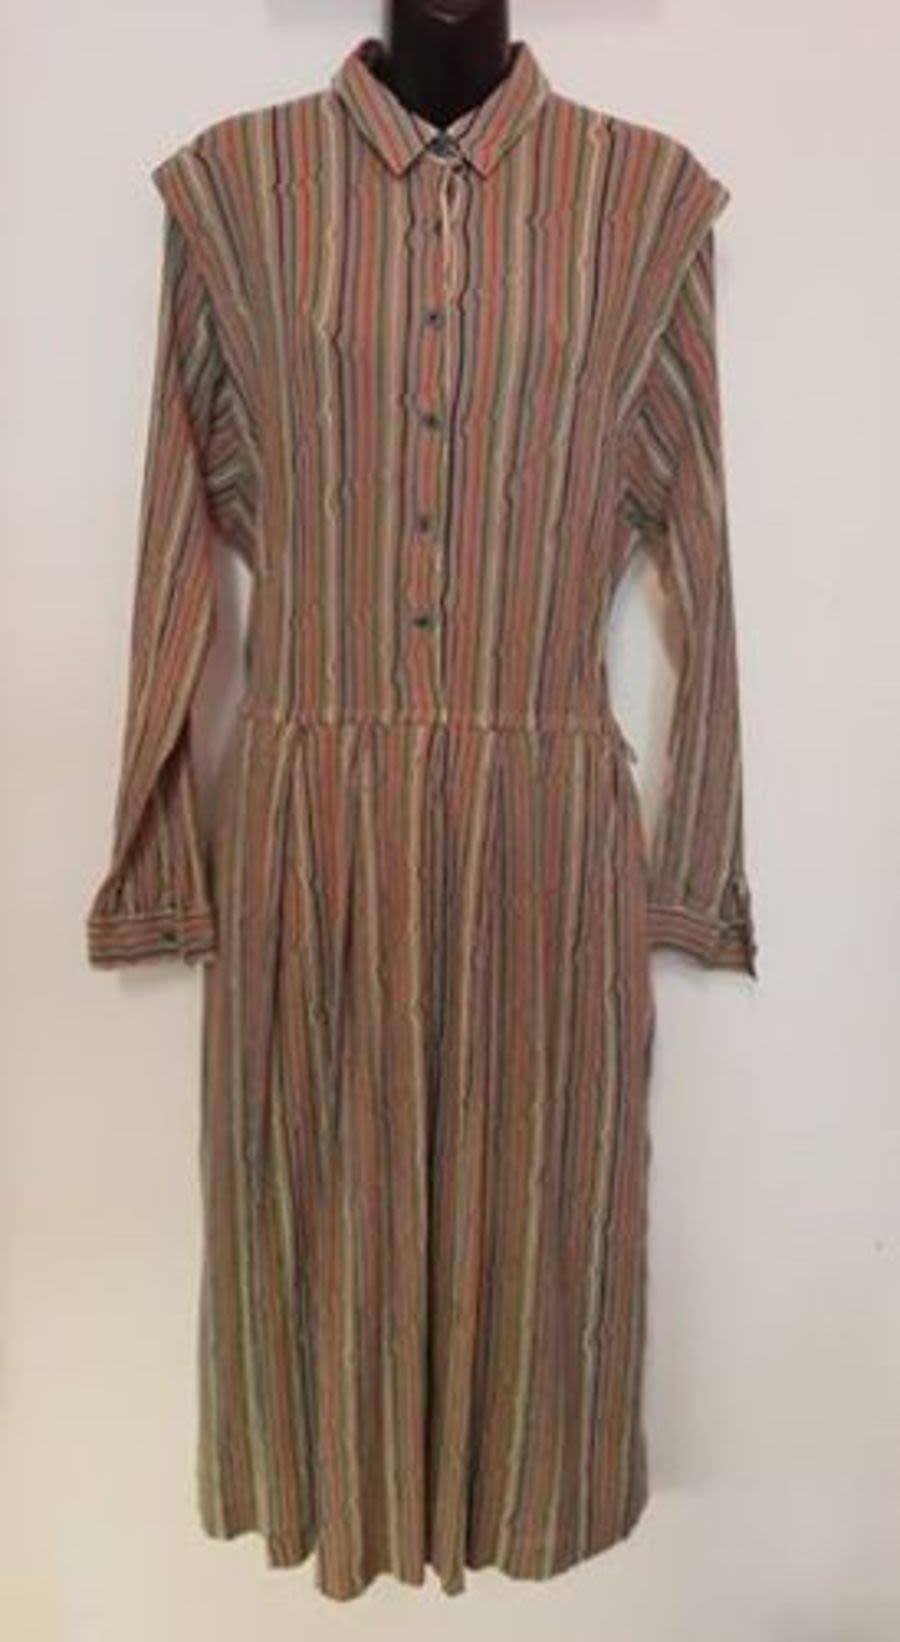 Vintage 1970's  Pinstriped Shirt-dress